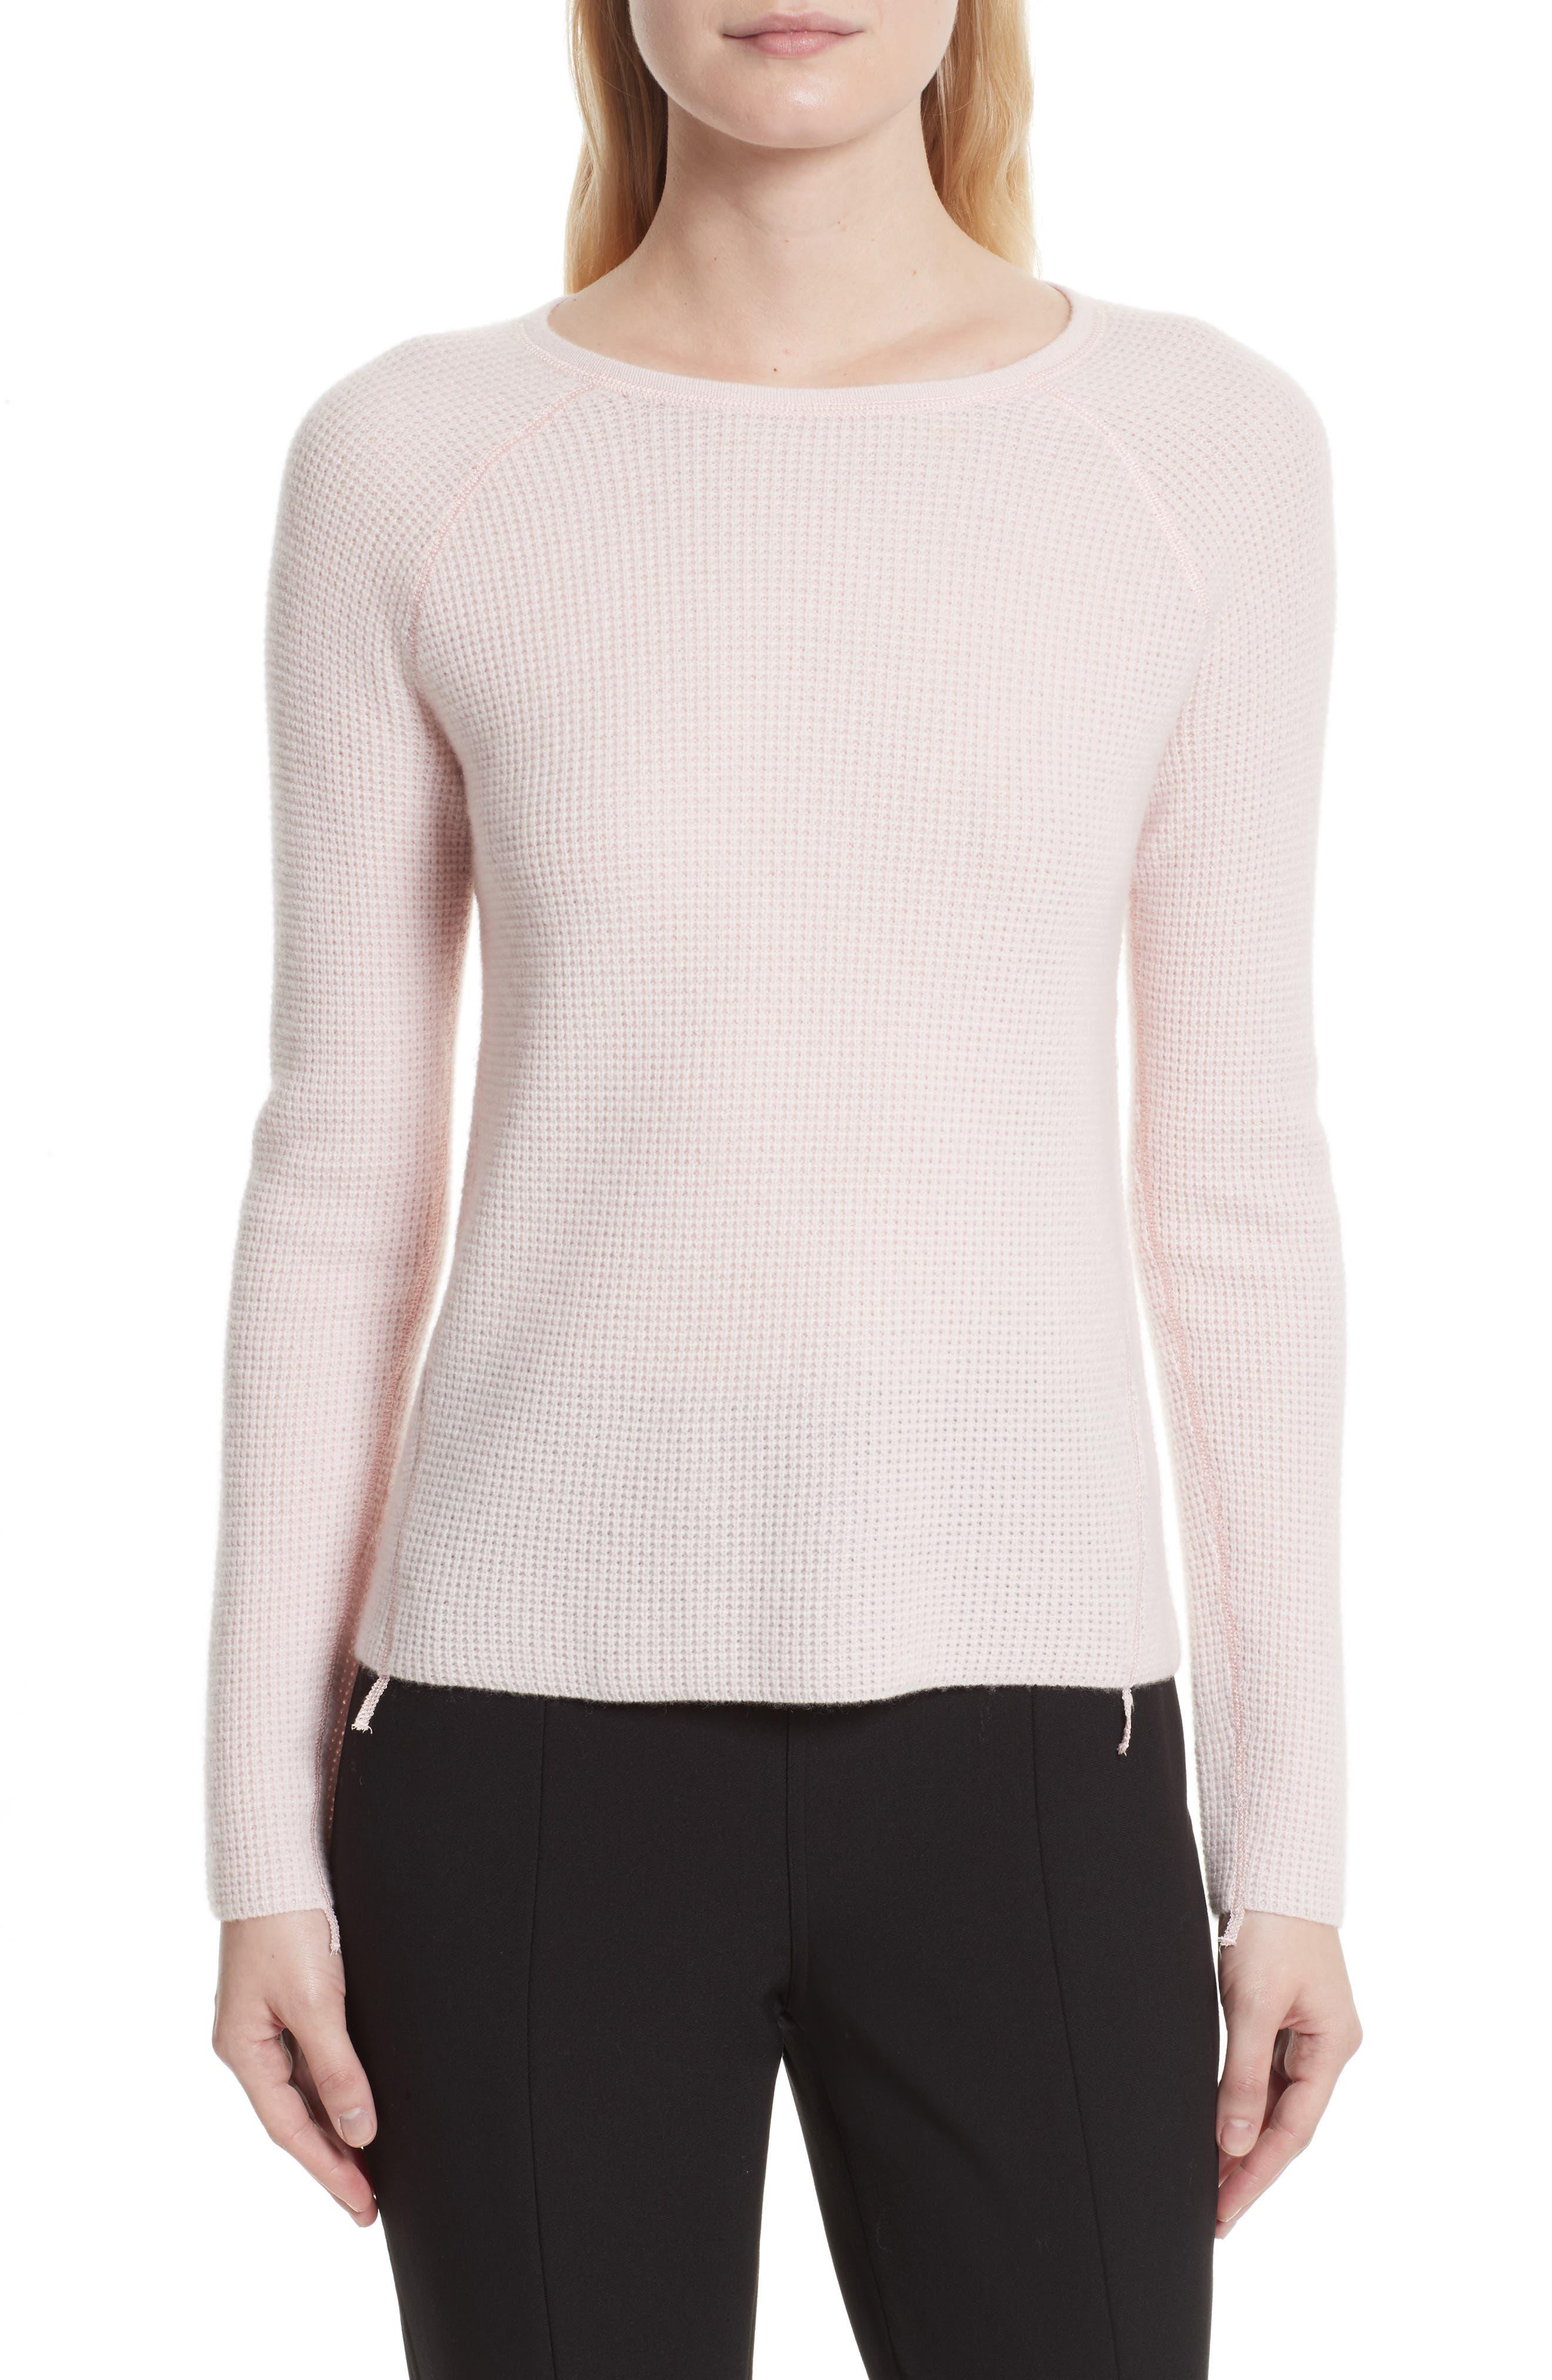 Karina Waffle Knit Cashmere Sweater,                         Main,                         color,